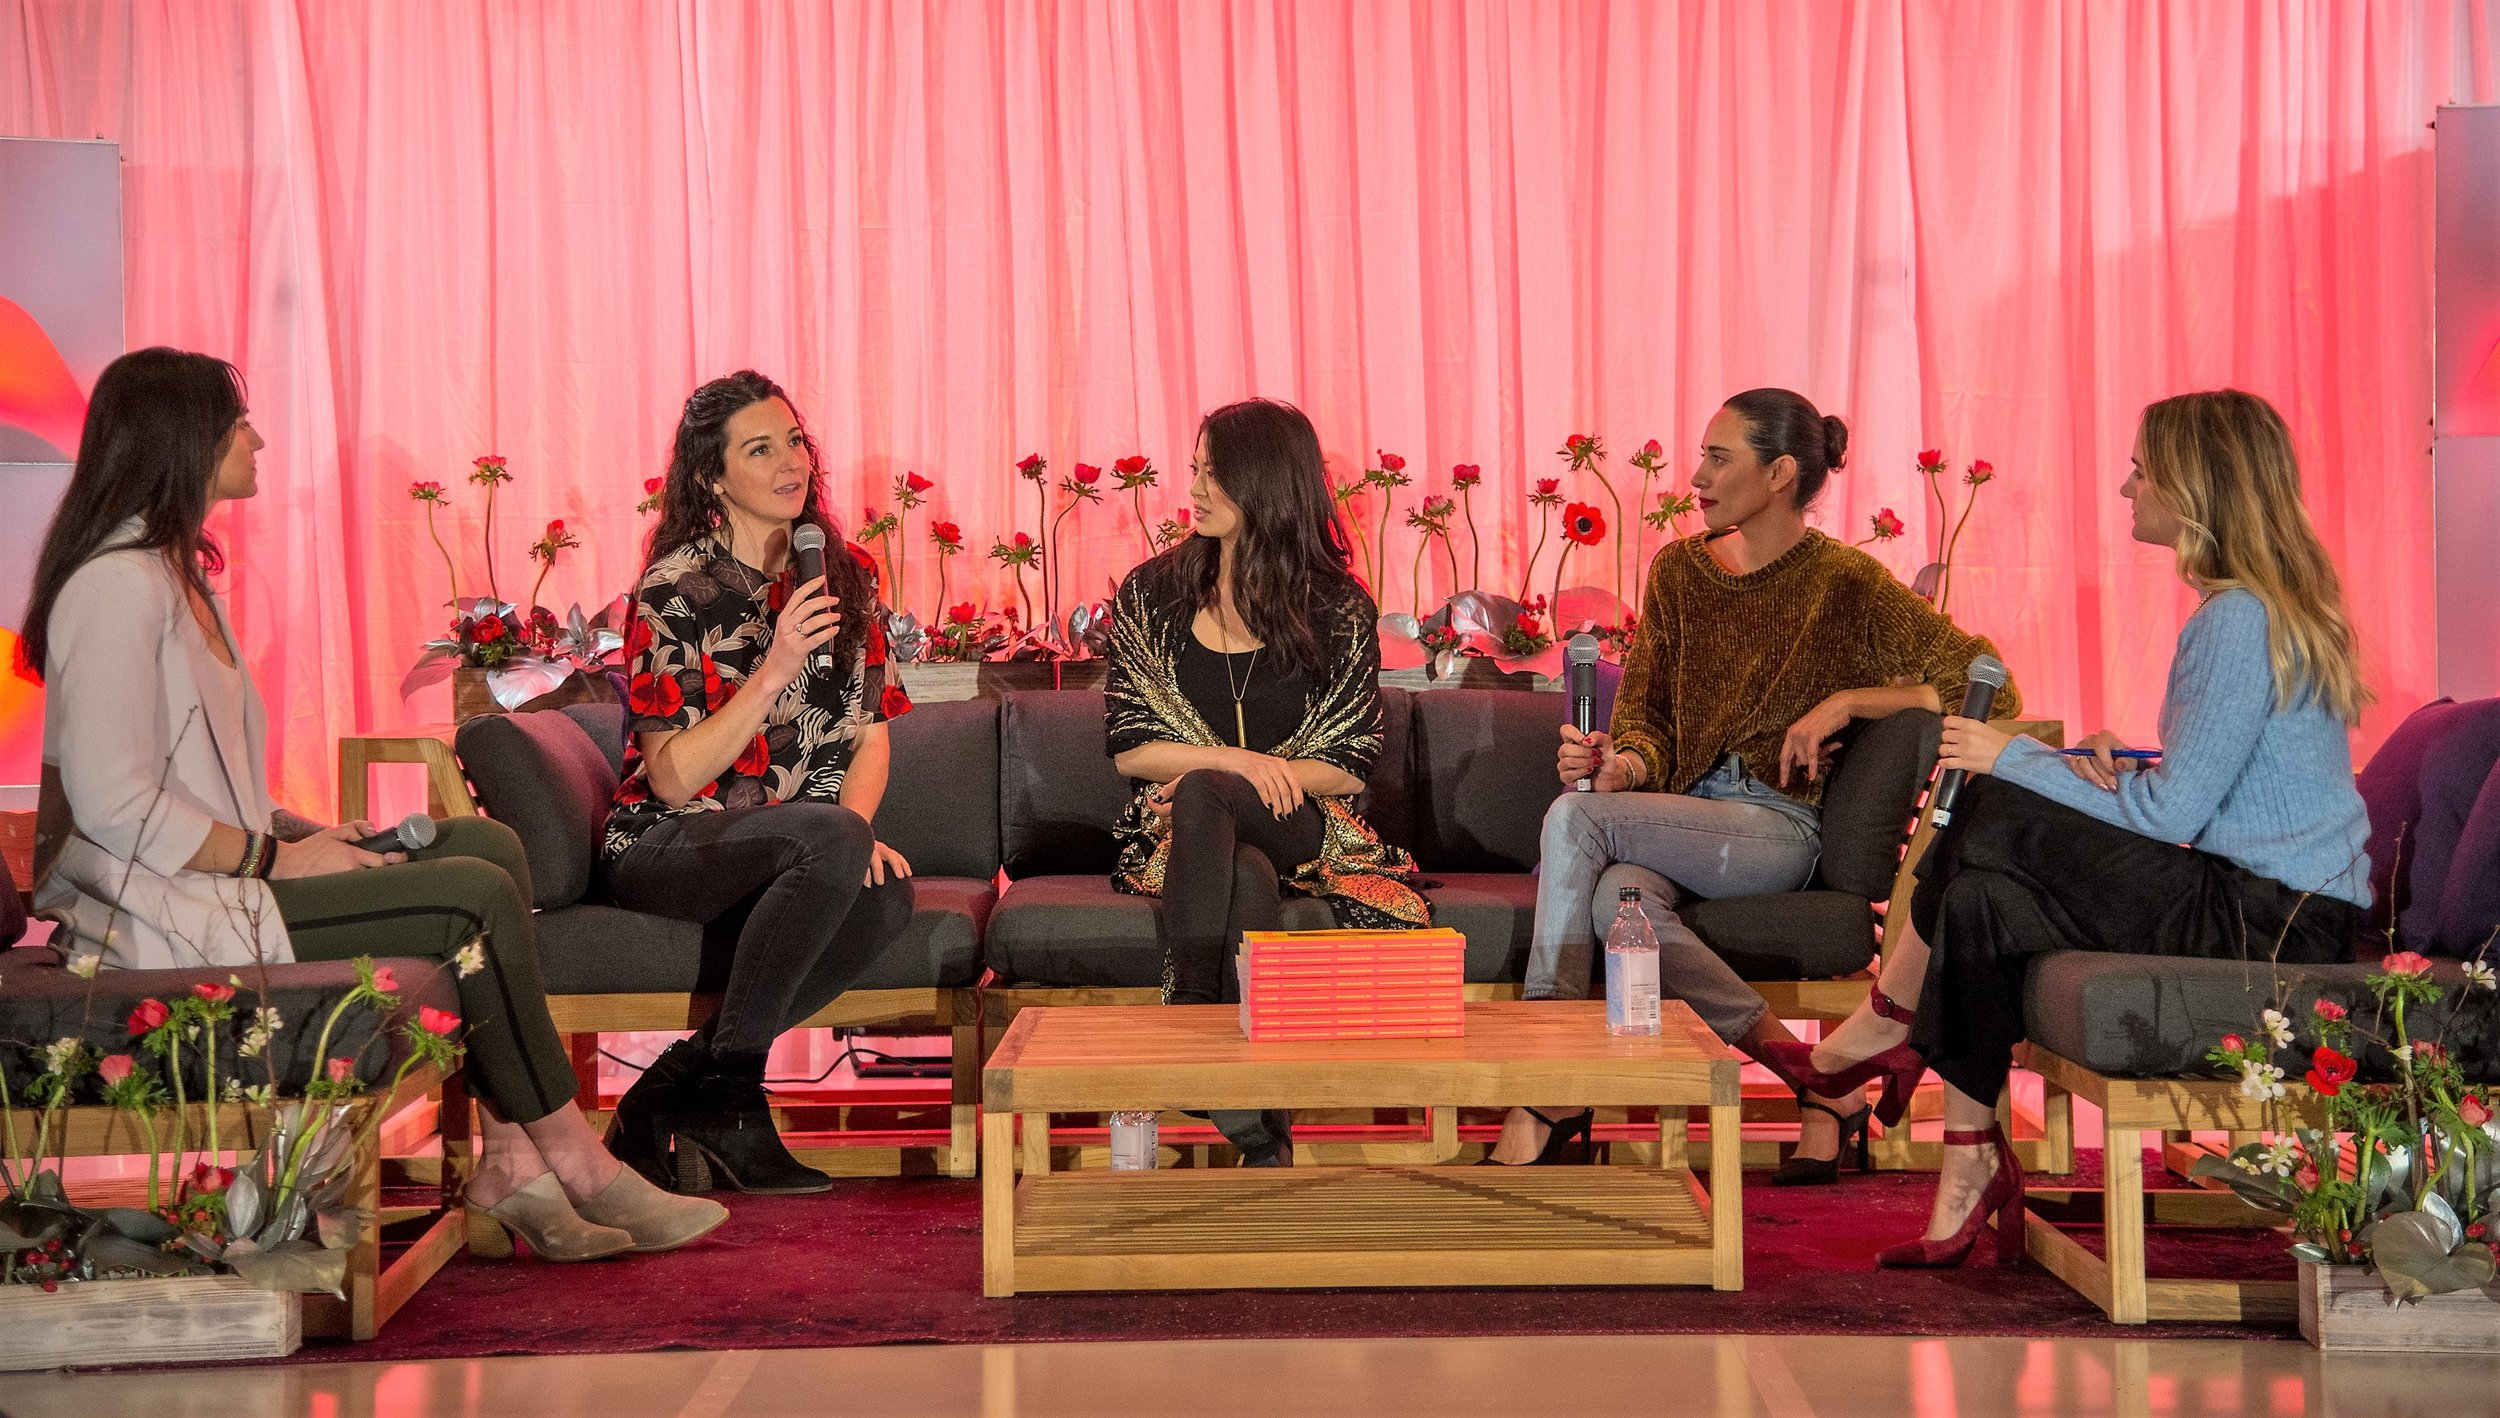 Lola Langusta (Stoned Fox) & Rachel Hazlett (Lucky 420) & Angela Mou (Elevate Jane) & Bianca Monica (Limone Creative)-Stay Boutique Live37 (1).jpg